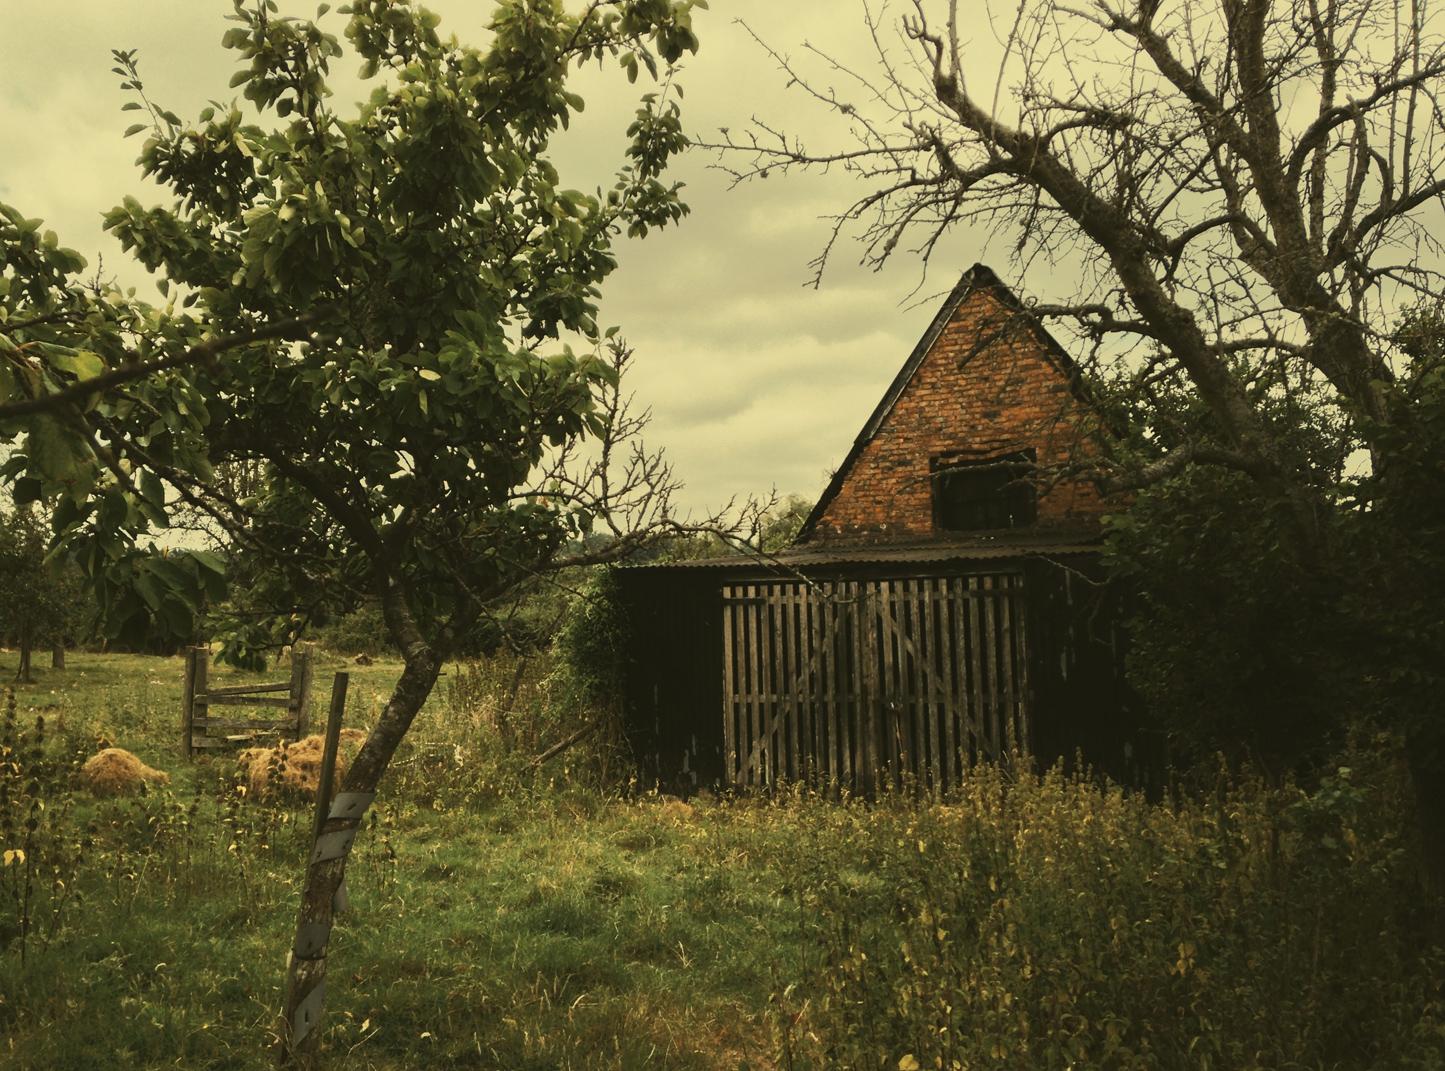 ciderhouse2.jpg